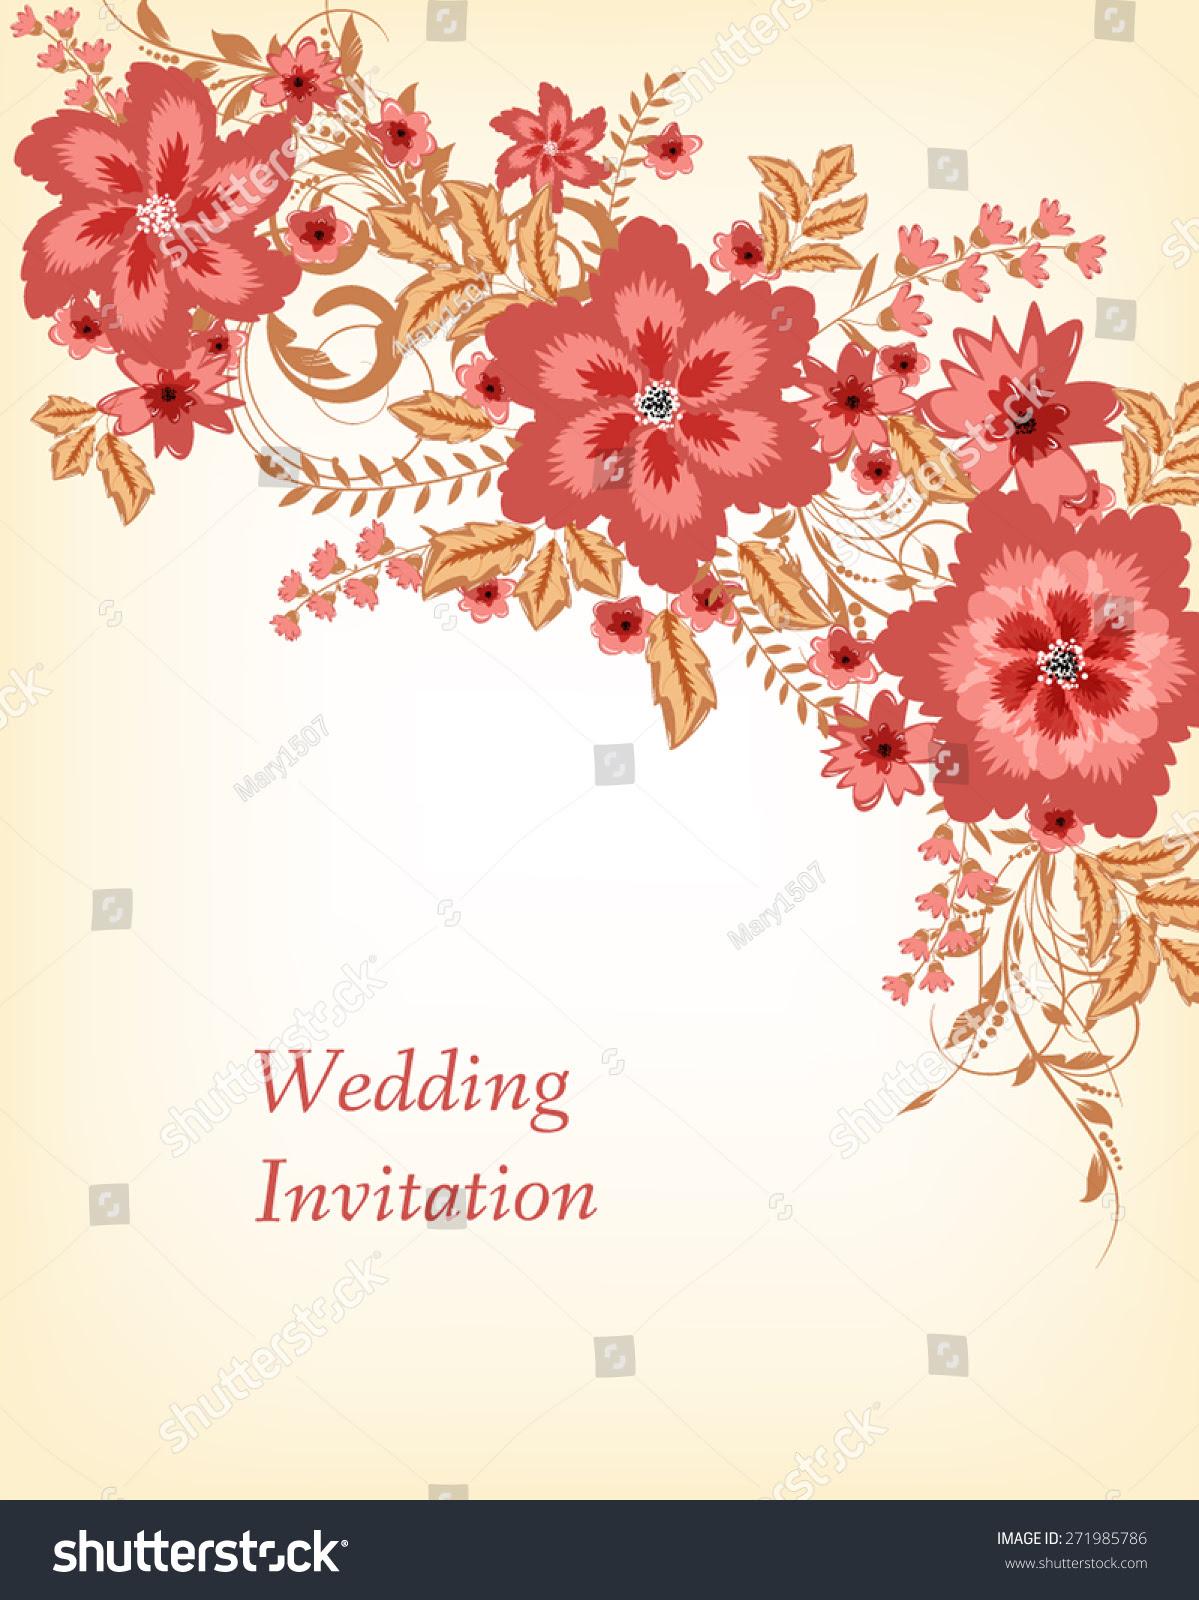 marriage invitation card background  wedding invitation